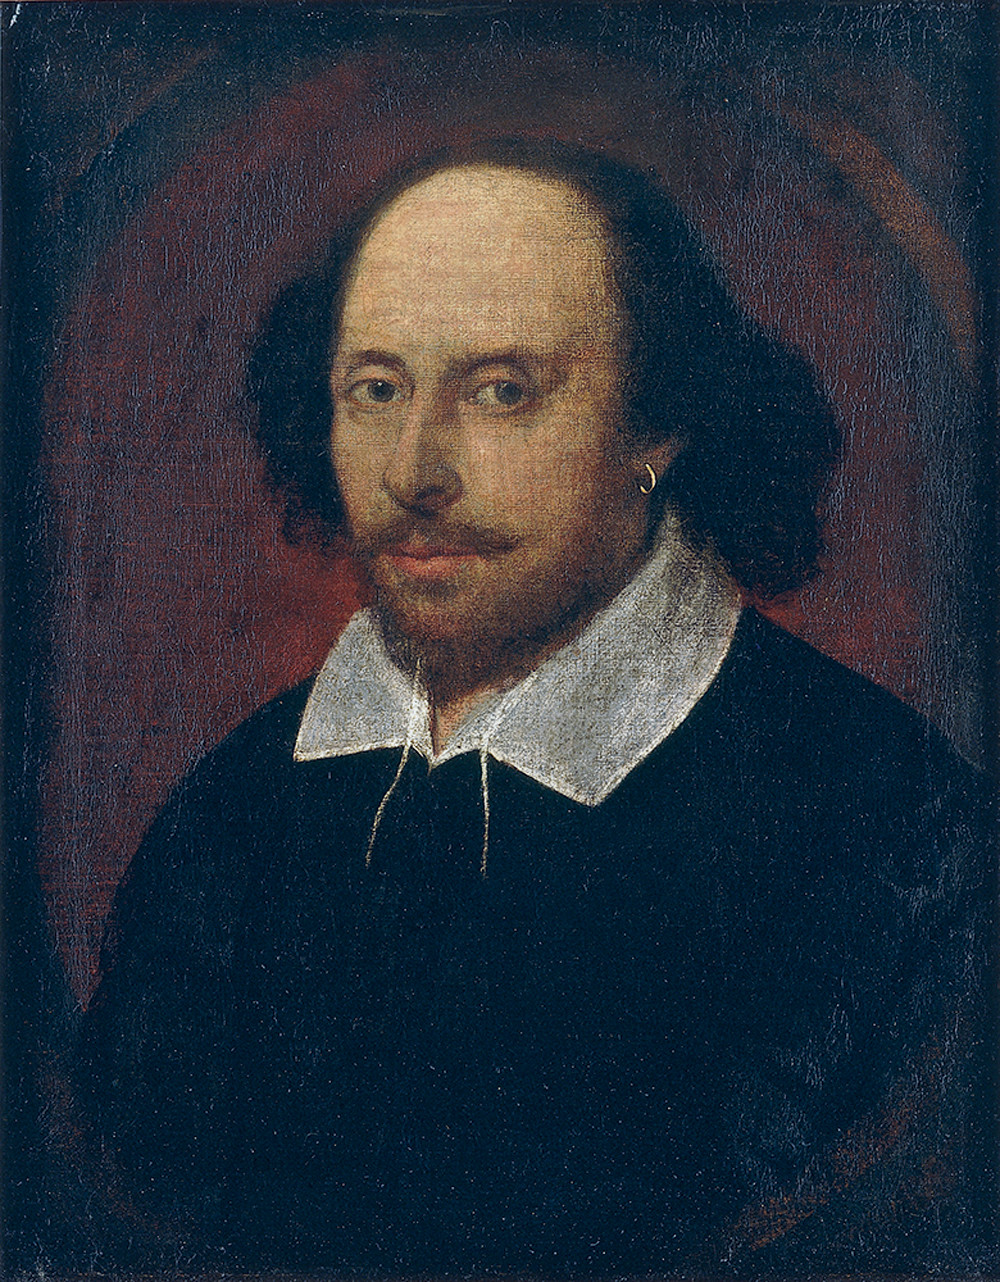 Retrato de William Shakespeare por John Taylor.